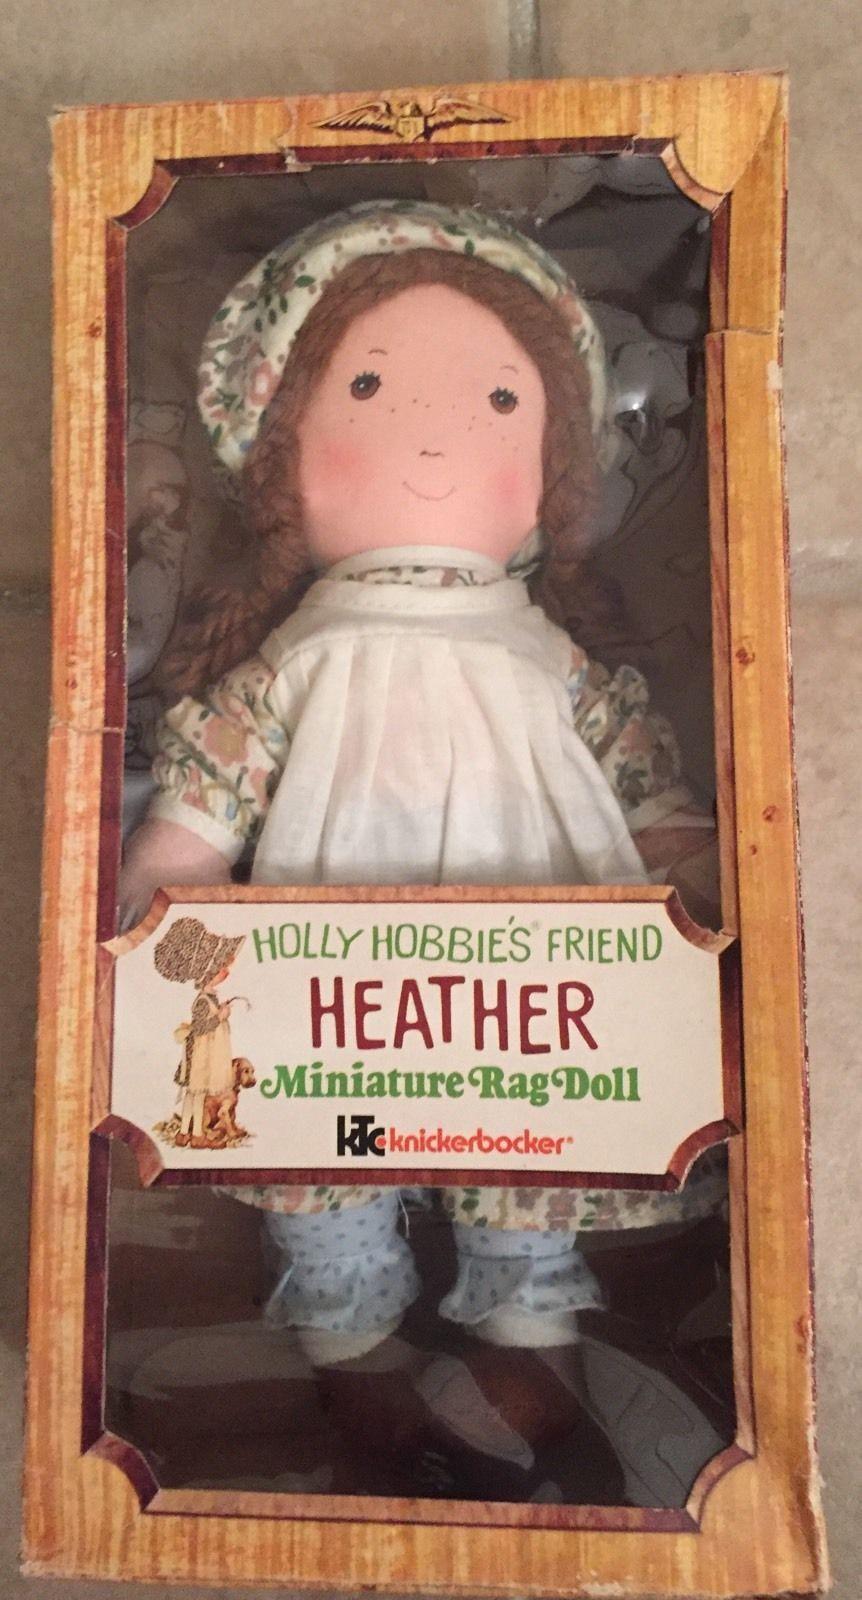 1970s holly hobbies friend heather by knickerbocker miniature 1970s holly hobbies friend heather by knickerbocker miniature rag doll in box ebay reviewsmspy